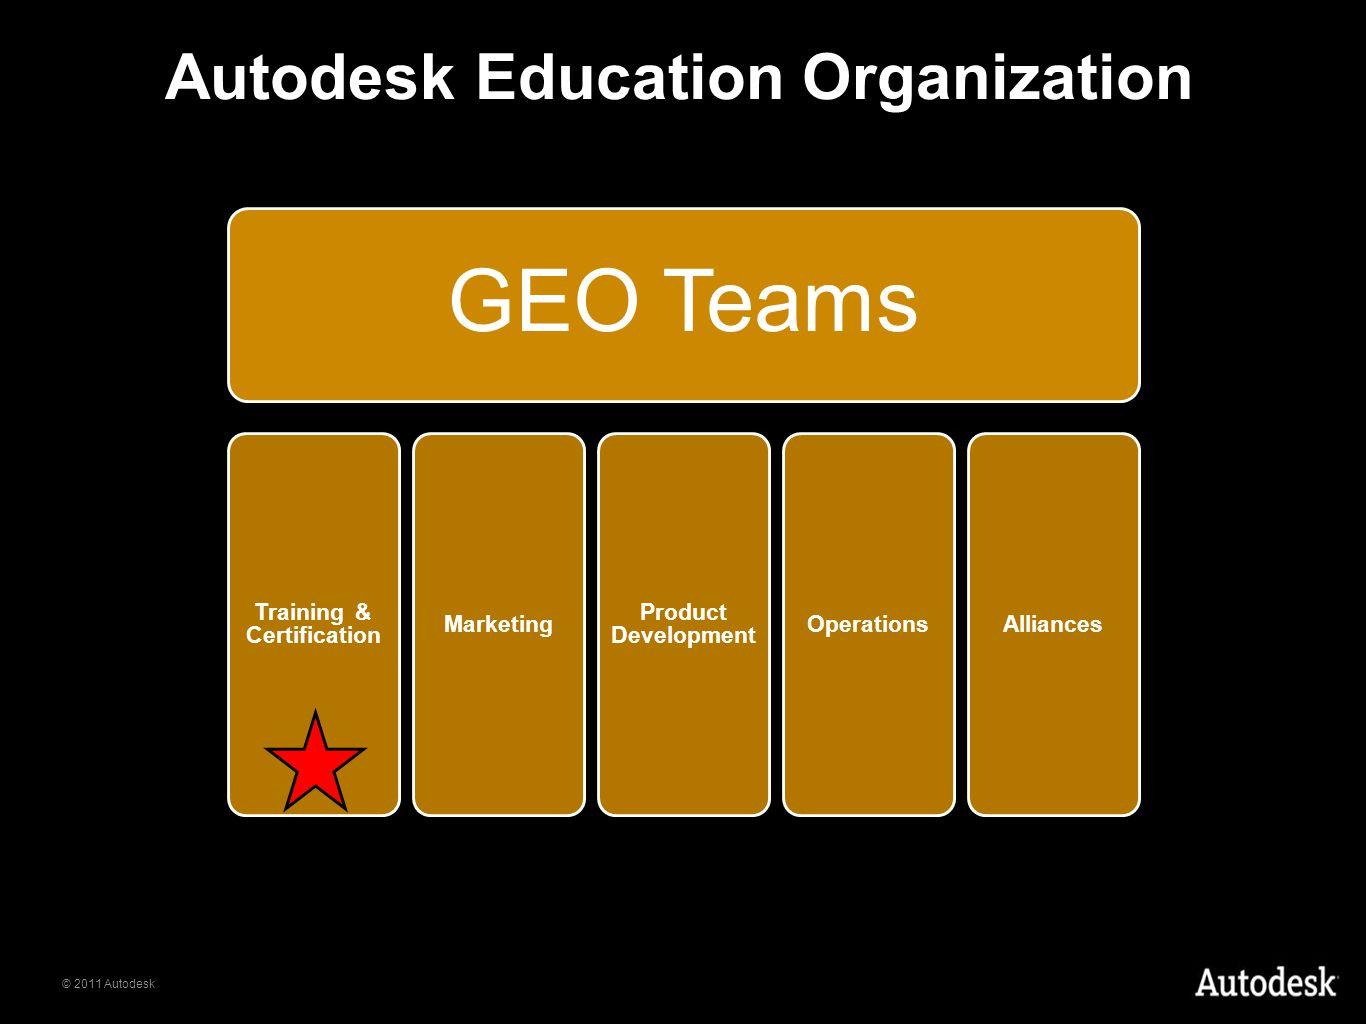 © 2011 Autodesk GEO Teams Training & Certification Marketing Product Development OperationsAlliances Autodesk Education Organization